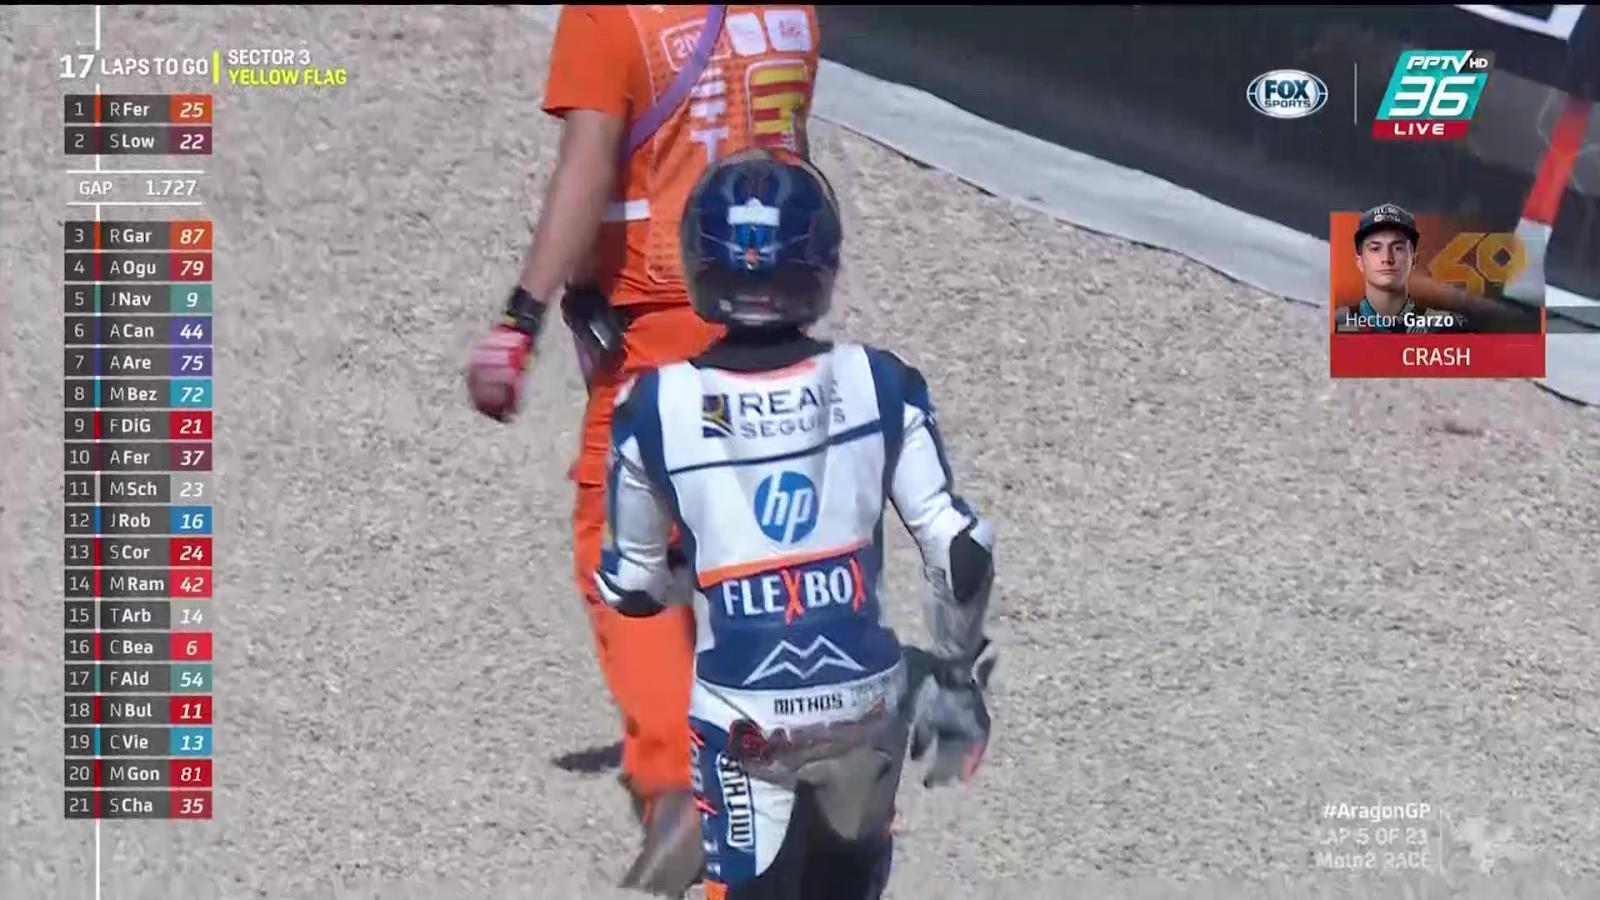 "Hector Garzo เข้าโค้งหลุดไลน์ ล้มพับไปที่โค้ง 8 Moto 2  สนามที่ 13 ในรายการ ""Gran Premio TISSOT de Aragón"""